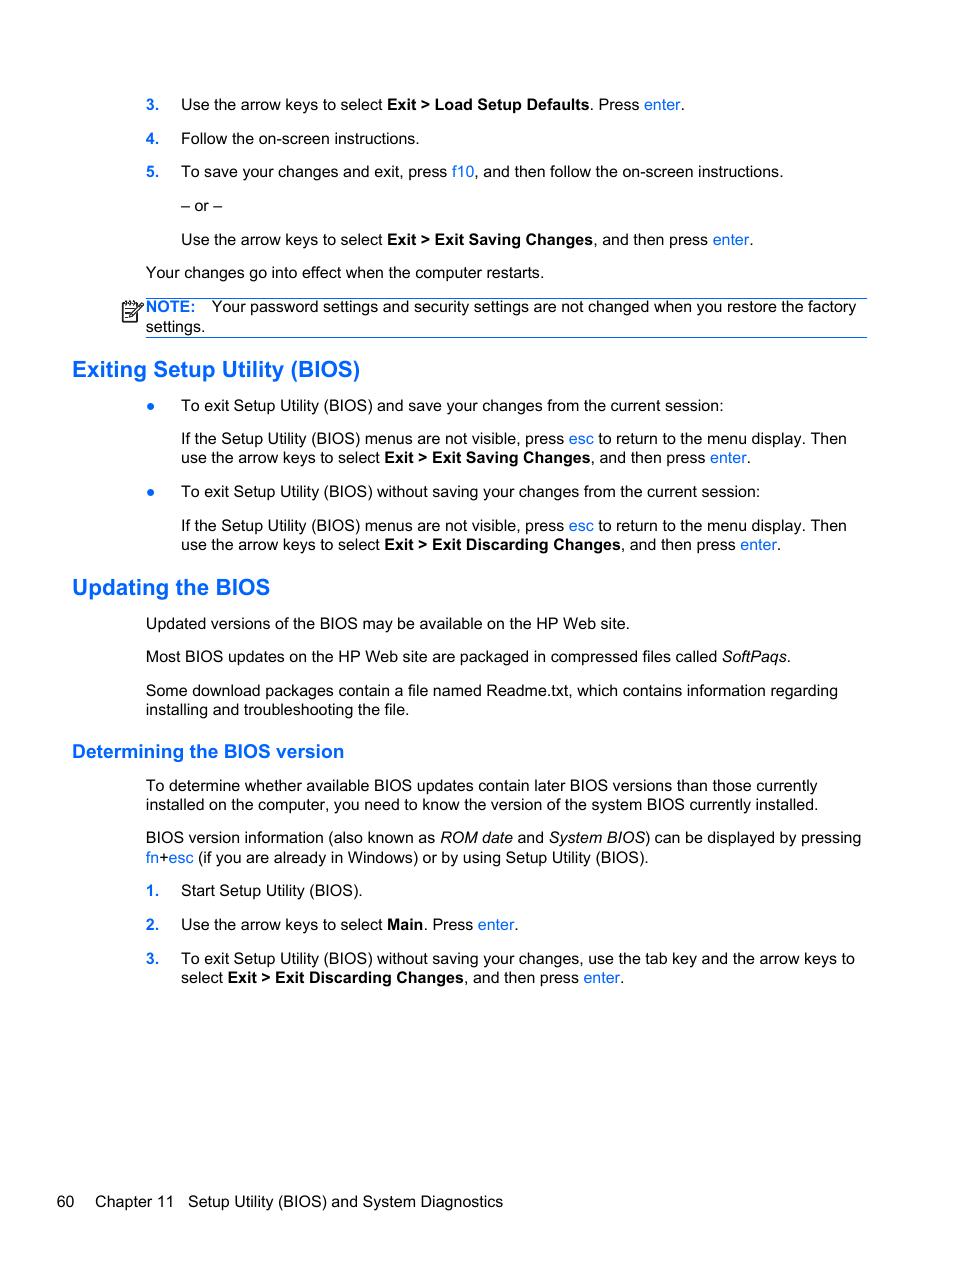 Hp notebook system bios update - Hp Notebook Factory Reset Restore Factory Bios Hp Exiting Setup Utility Bios Updating The Bios